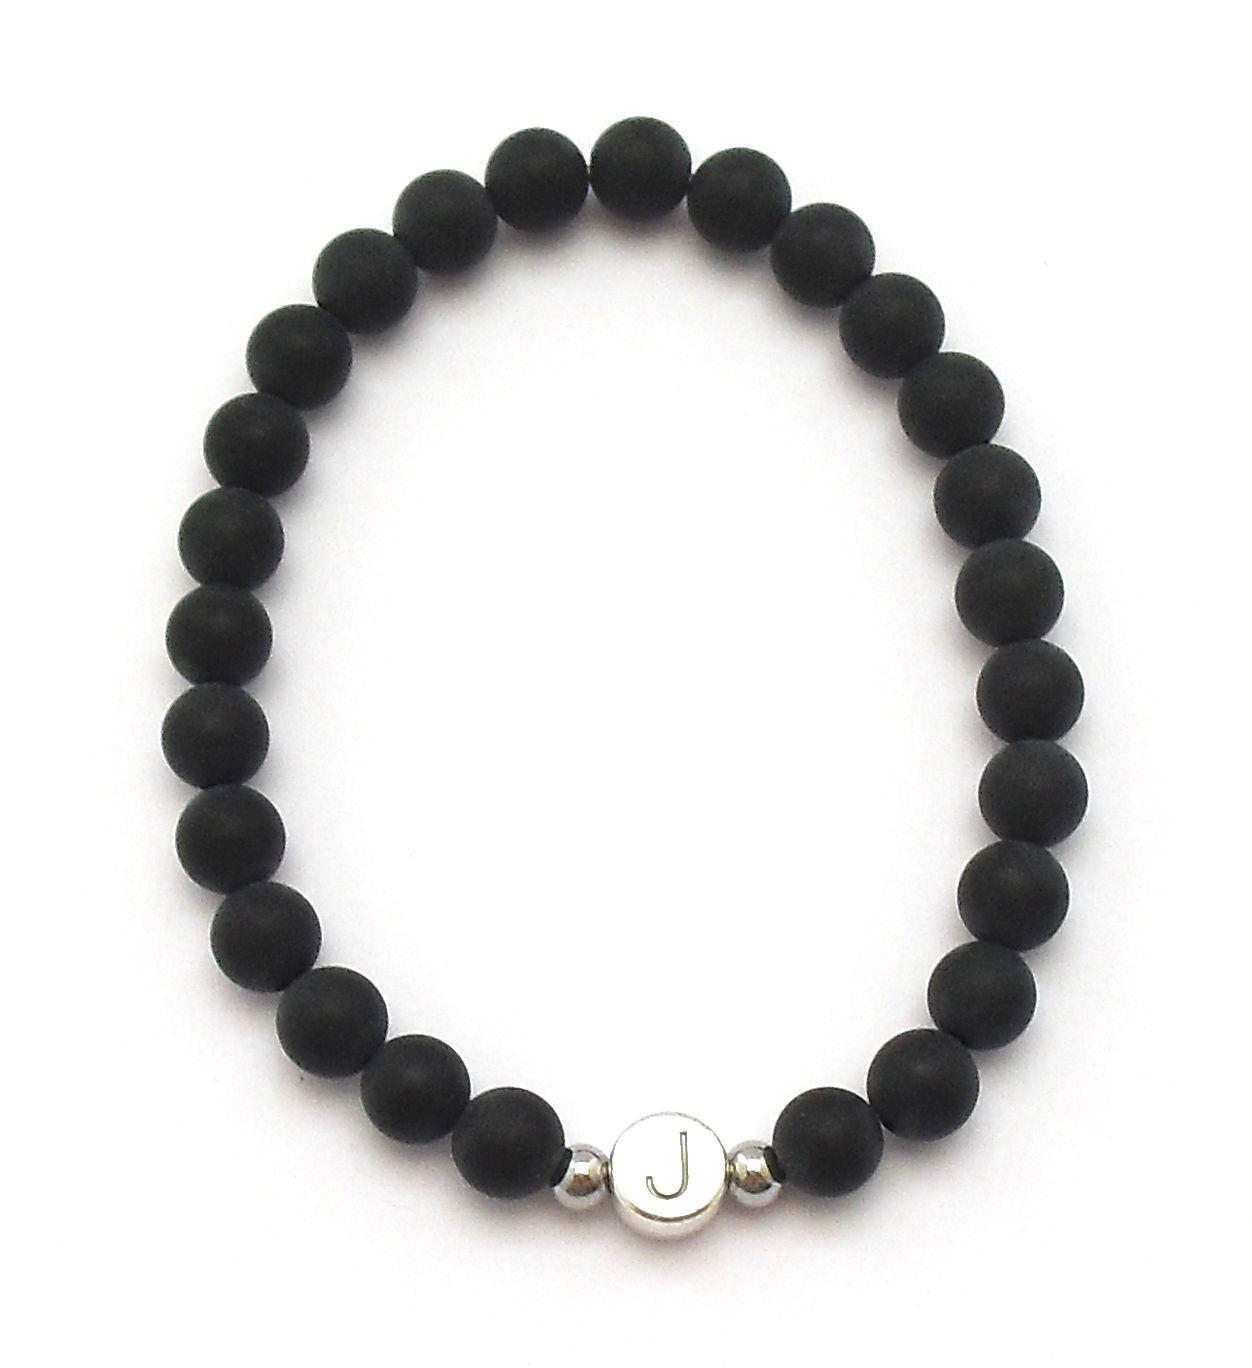 niedriger Preis gutes Angebot niedrigster Rabatt Partnerarmband mit schwarzen Perlen kaufen. Partnerarmbänder ...